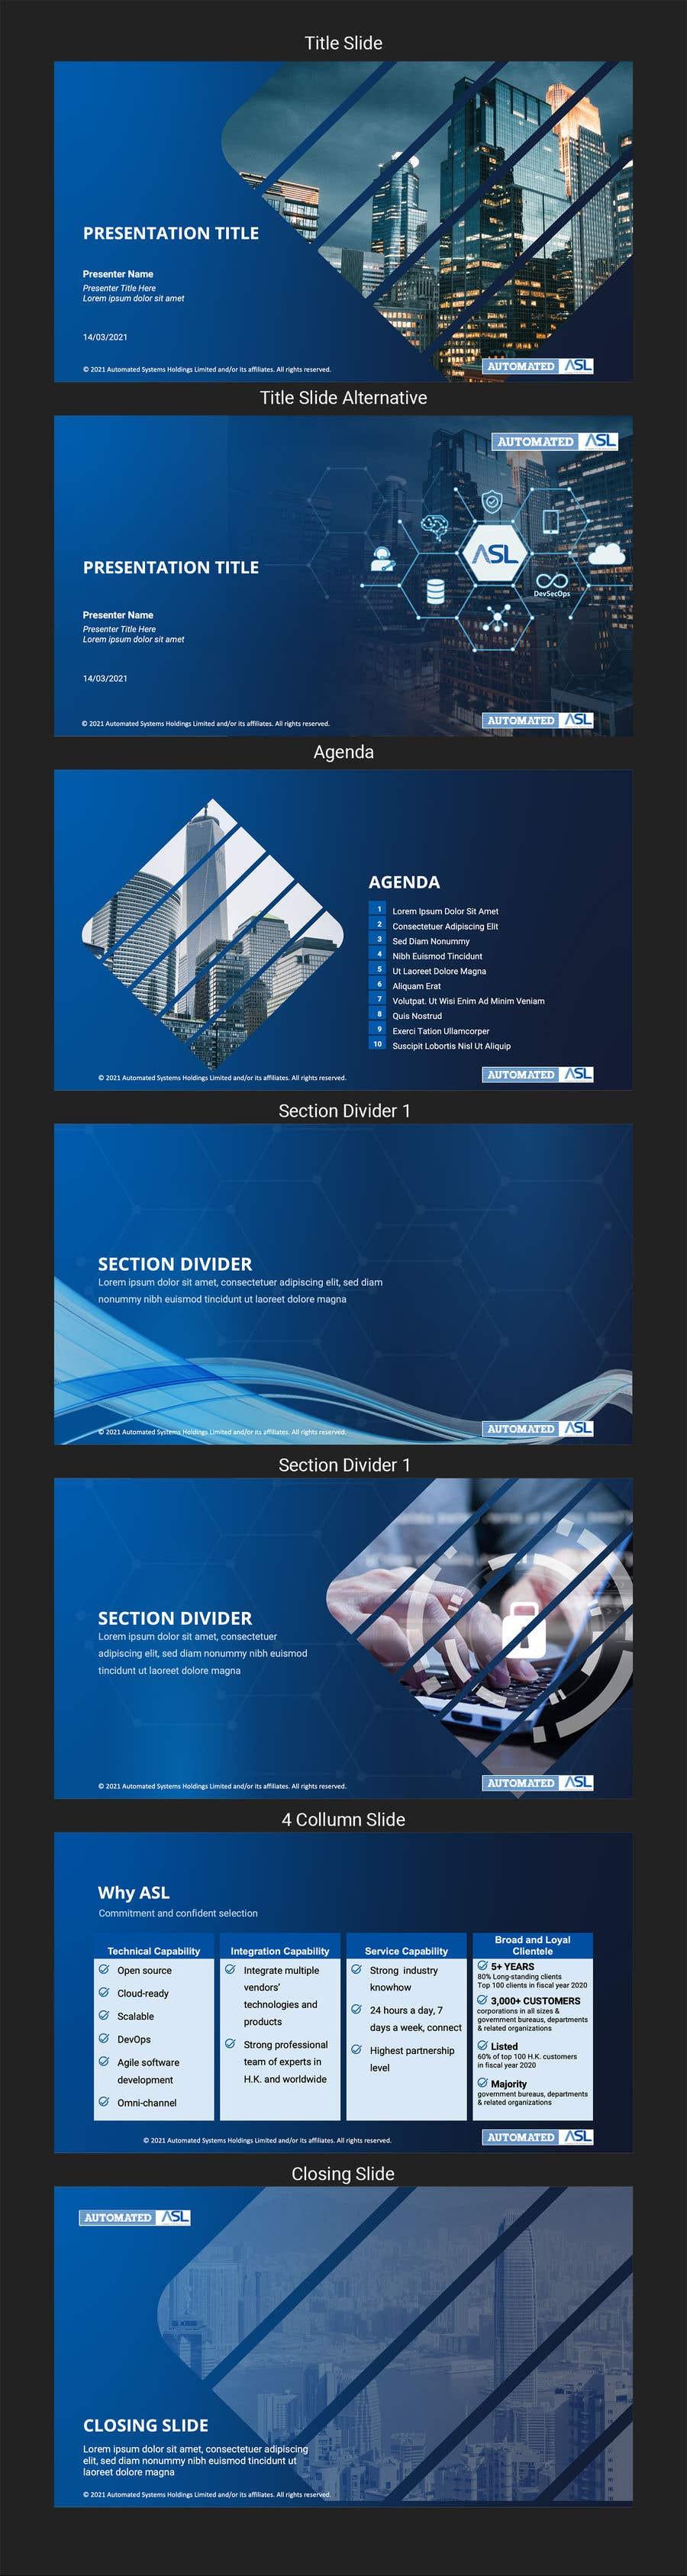 Bài tham dự cuộc thi #                                        34                                      cho                                         Corporate PPT Template Design (6 slides)